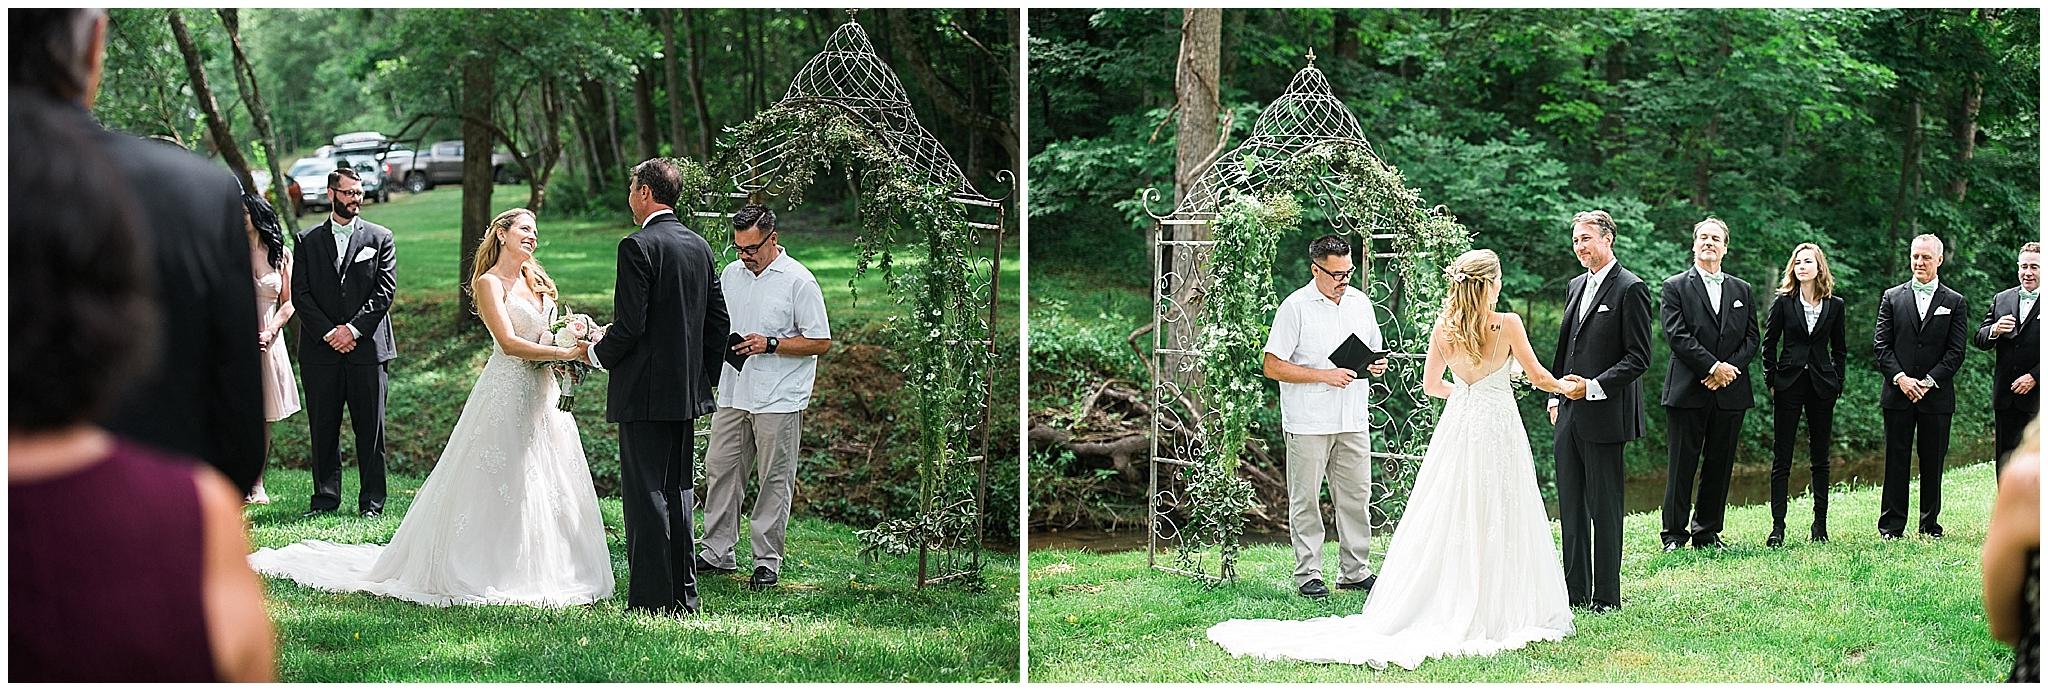 Wedding_Asheville_Photography_Junebug_Retro_Resort_4.jpg